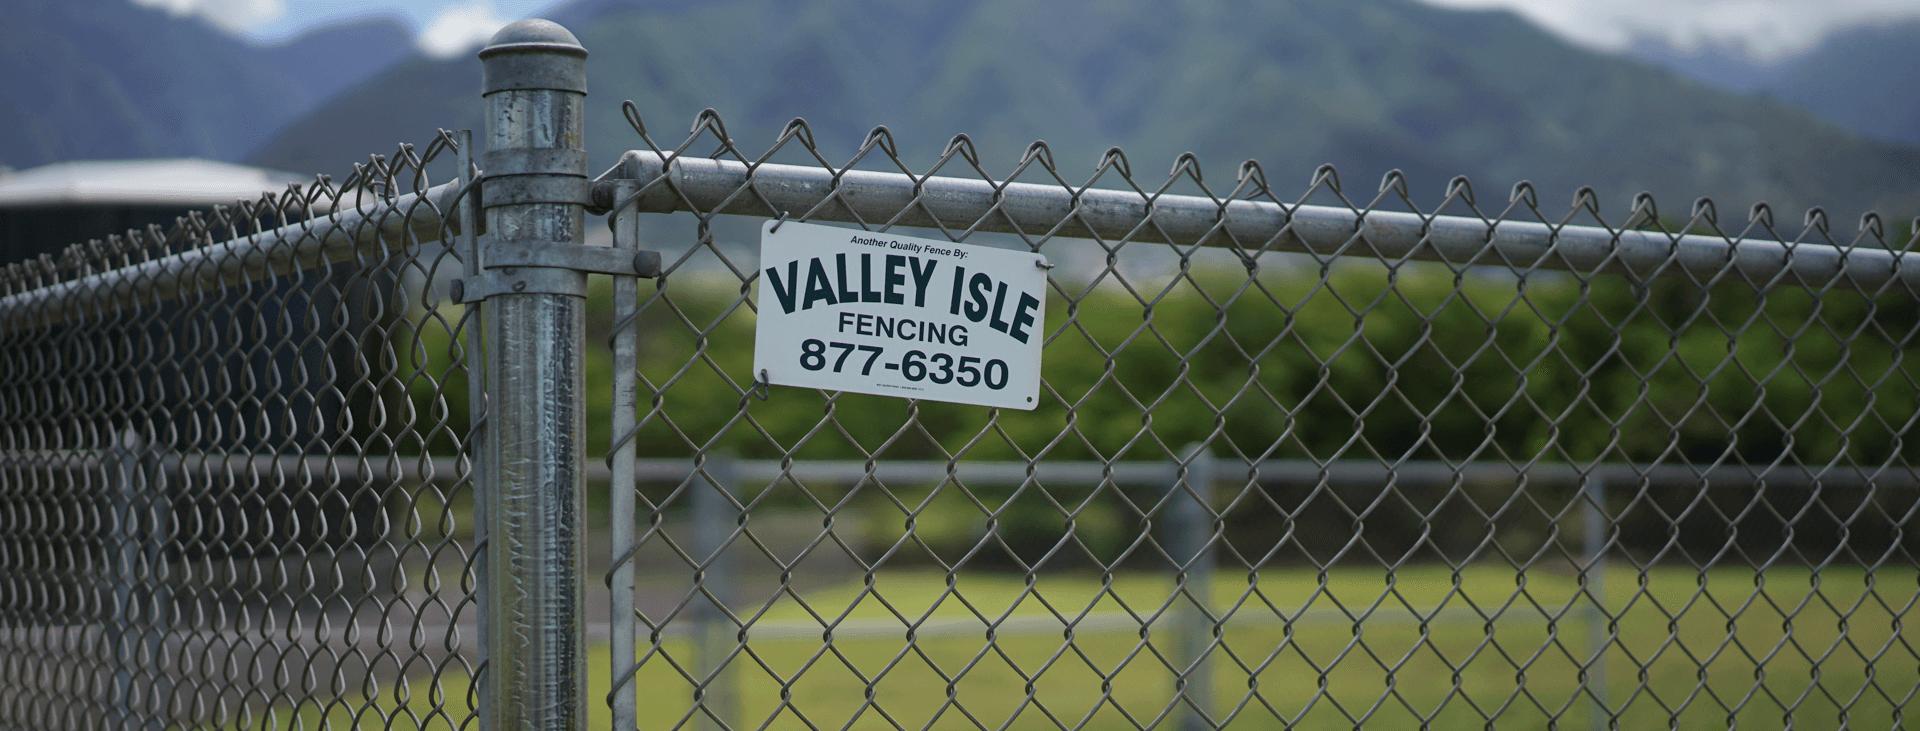 Valley Isle Fencing Residential Fencing Puunene Hi